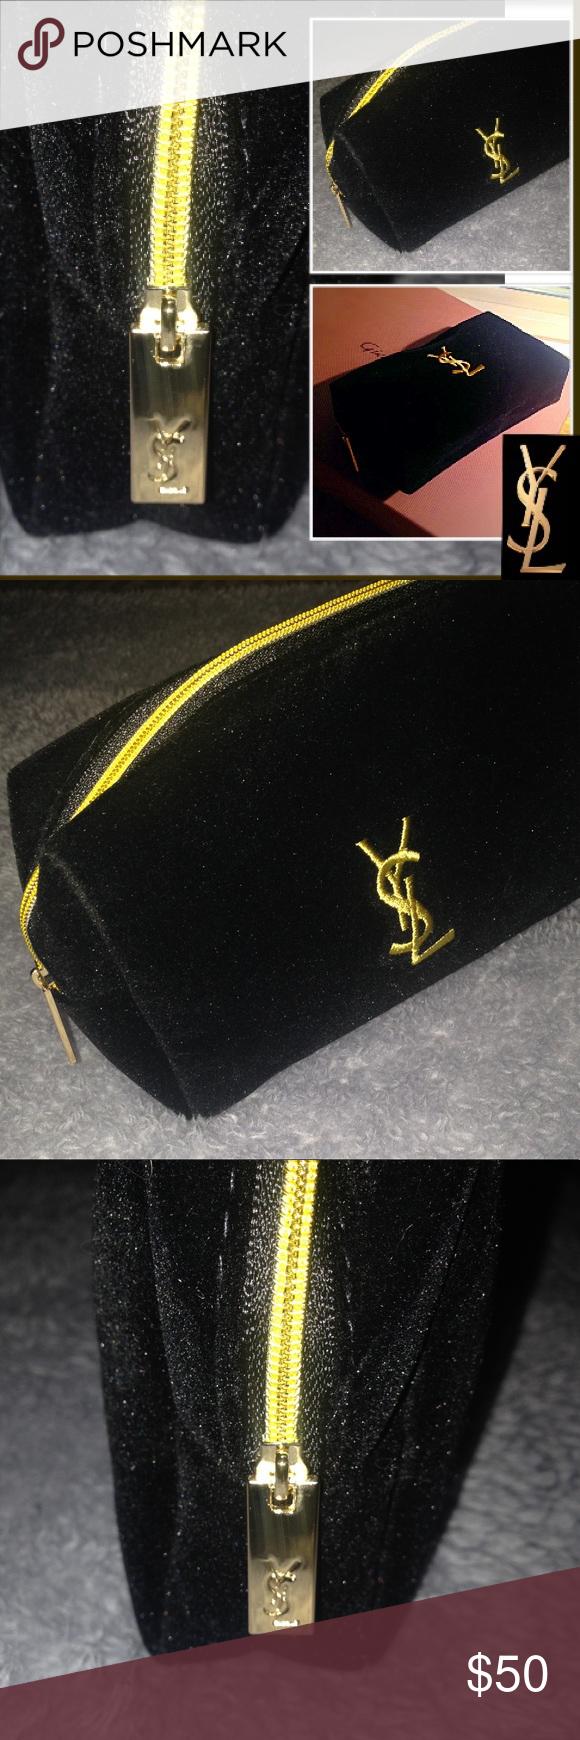 66a62760fa0b 🍋YSL VIP GIFT-Travel Makeup Bag Authentic VIP Yves Saint Laurent -Black  Velvet w  Gold Accents Travel Makeup Bag. Brand New Yves Saint Laurent Bags  ...